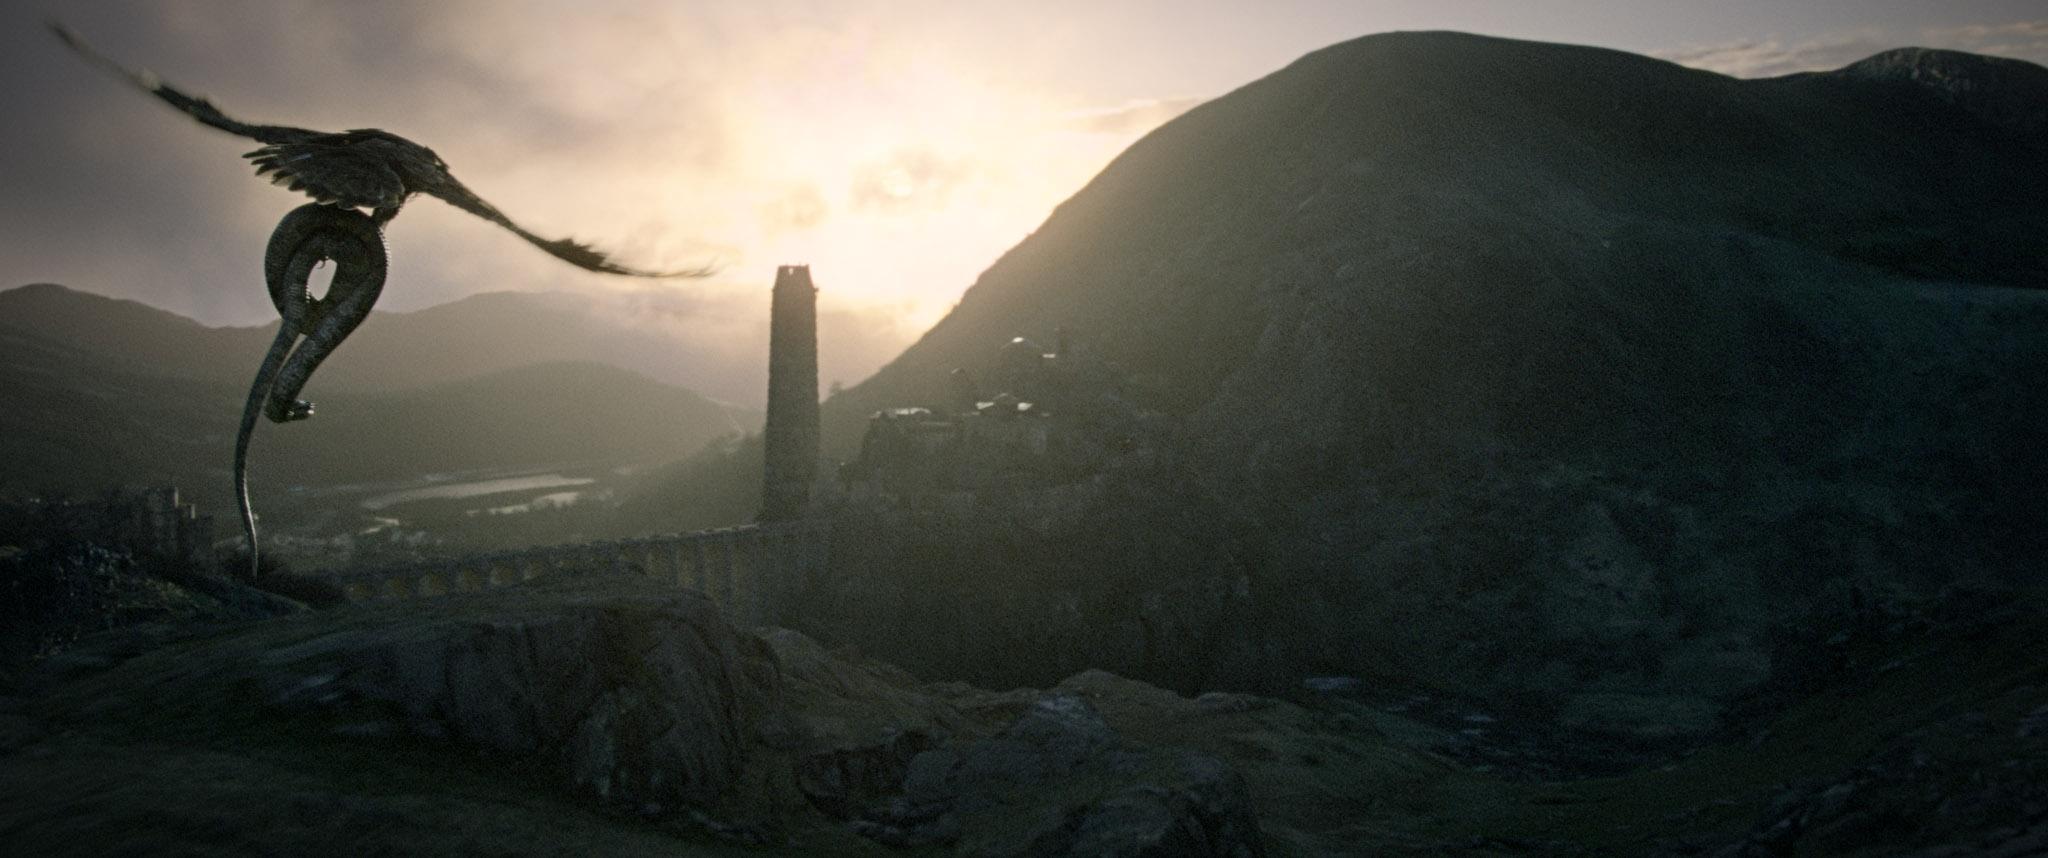 King_Arthur_Legend_of_the_Sword 4K UHD Blu-ray Review Szene 10